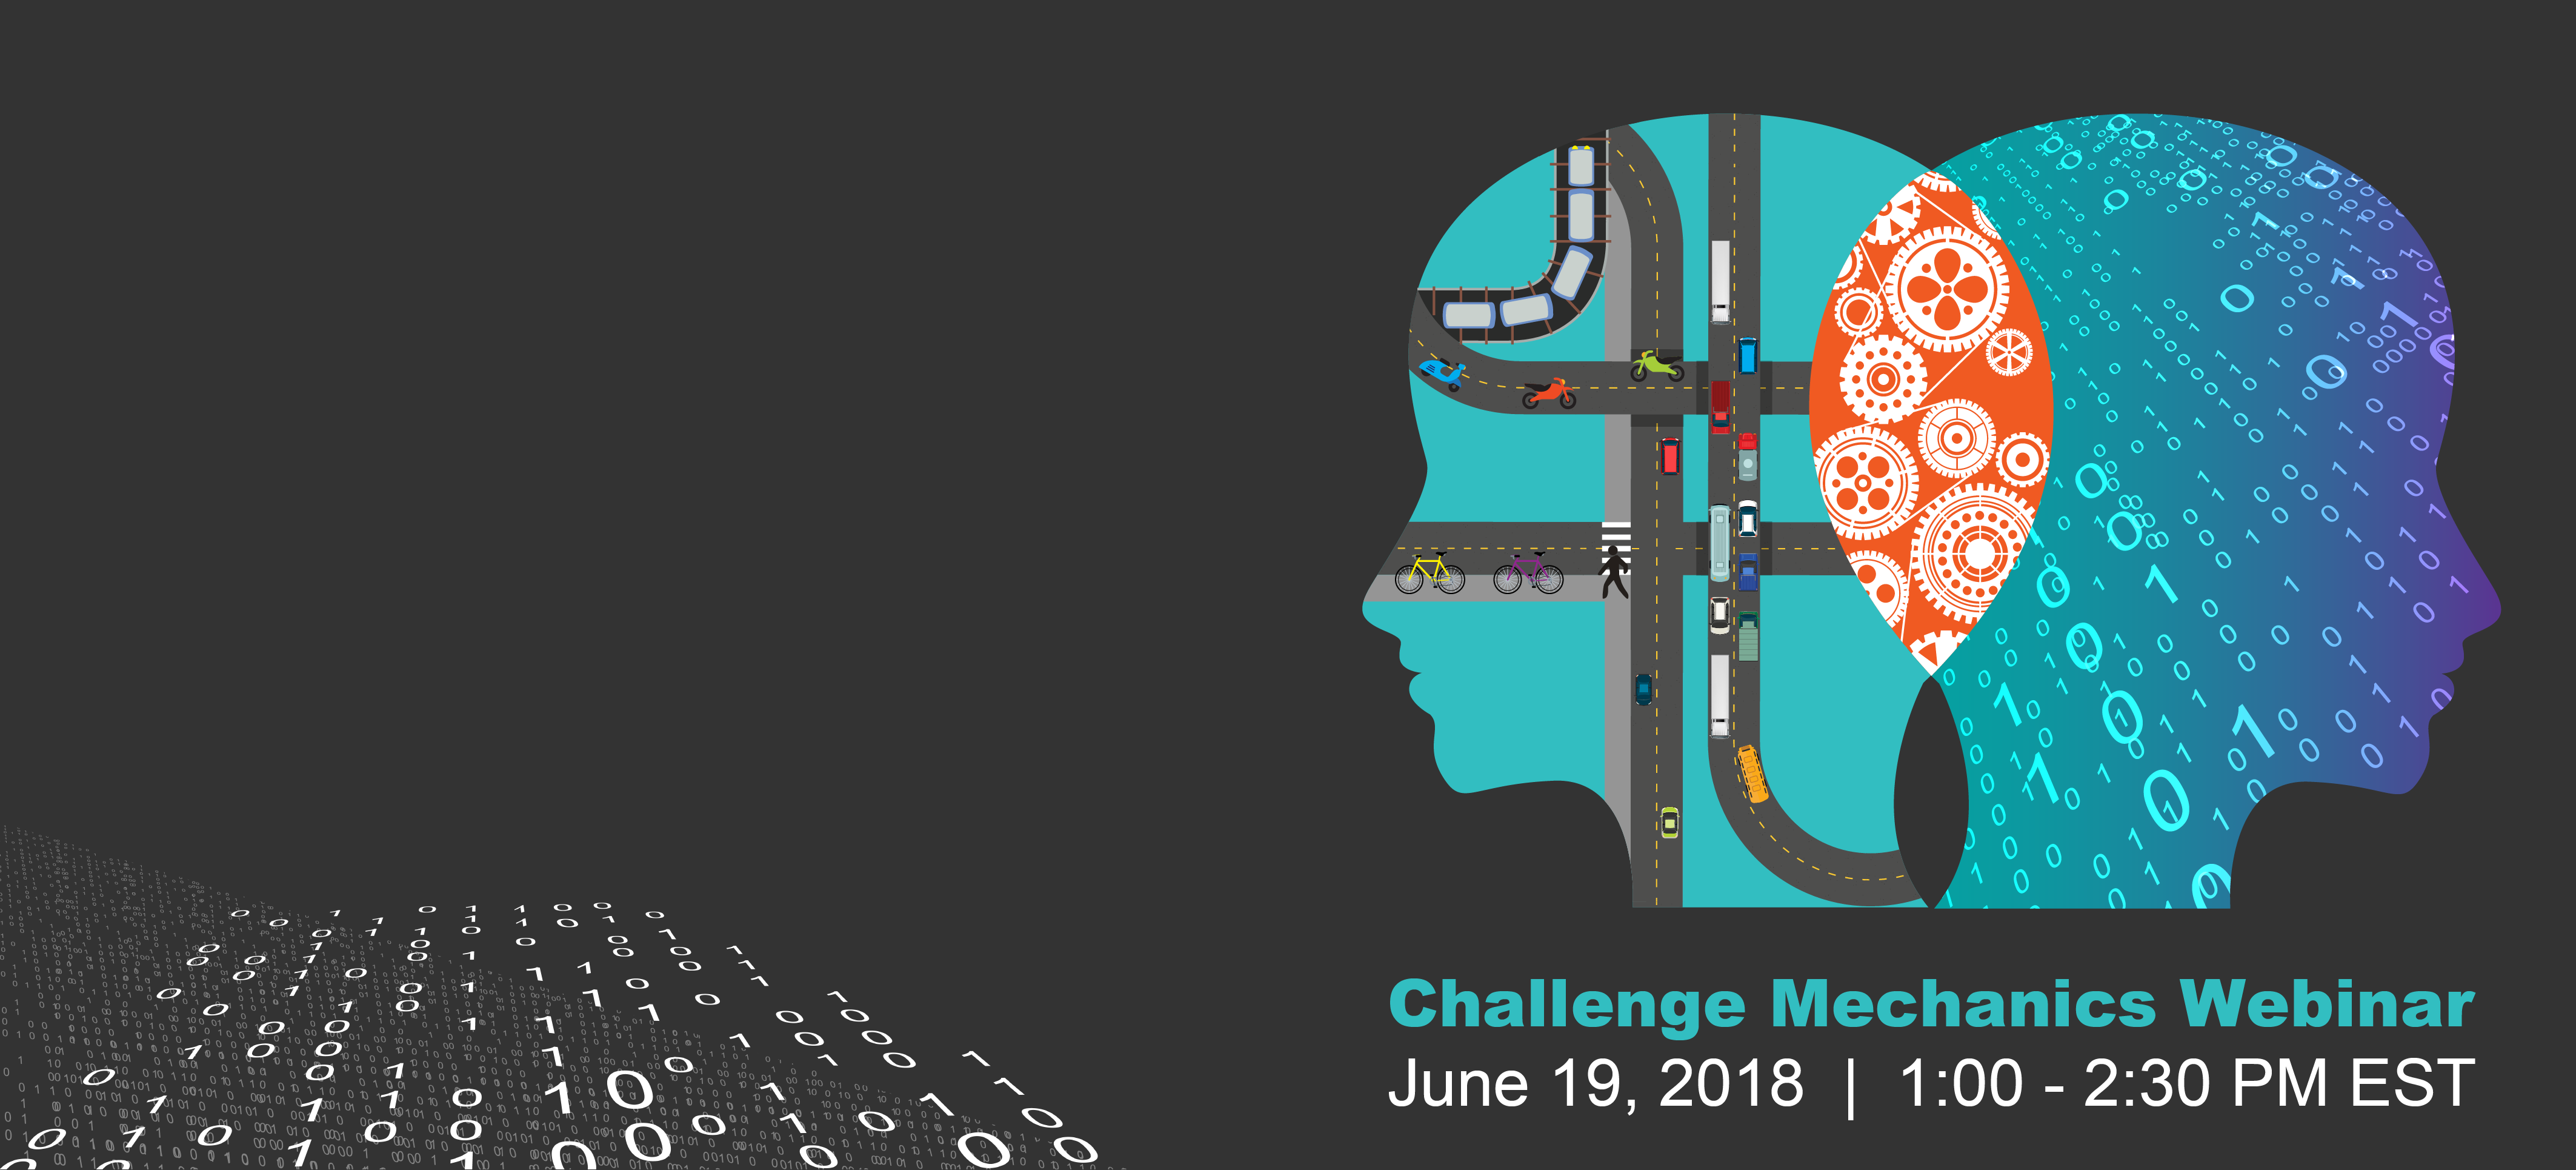 Webinar 1: Challenge Mechanics, June 19, 1 to 2:30 pm